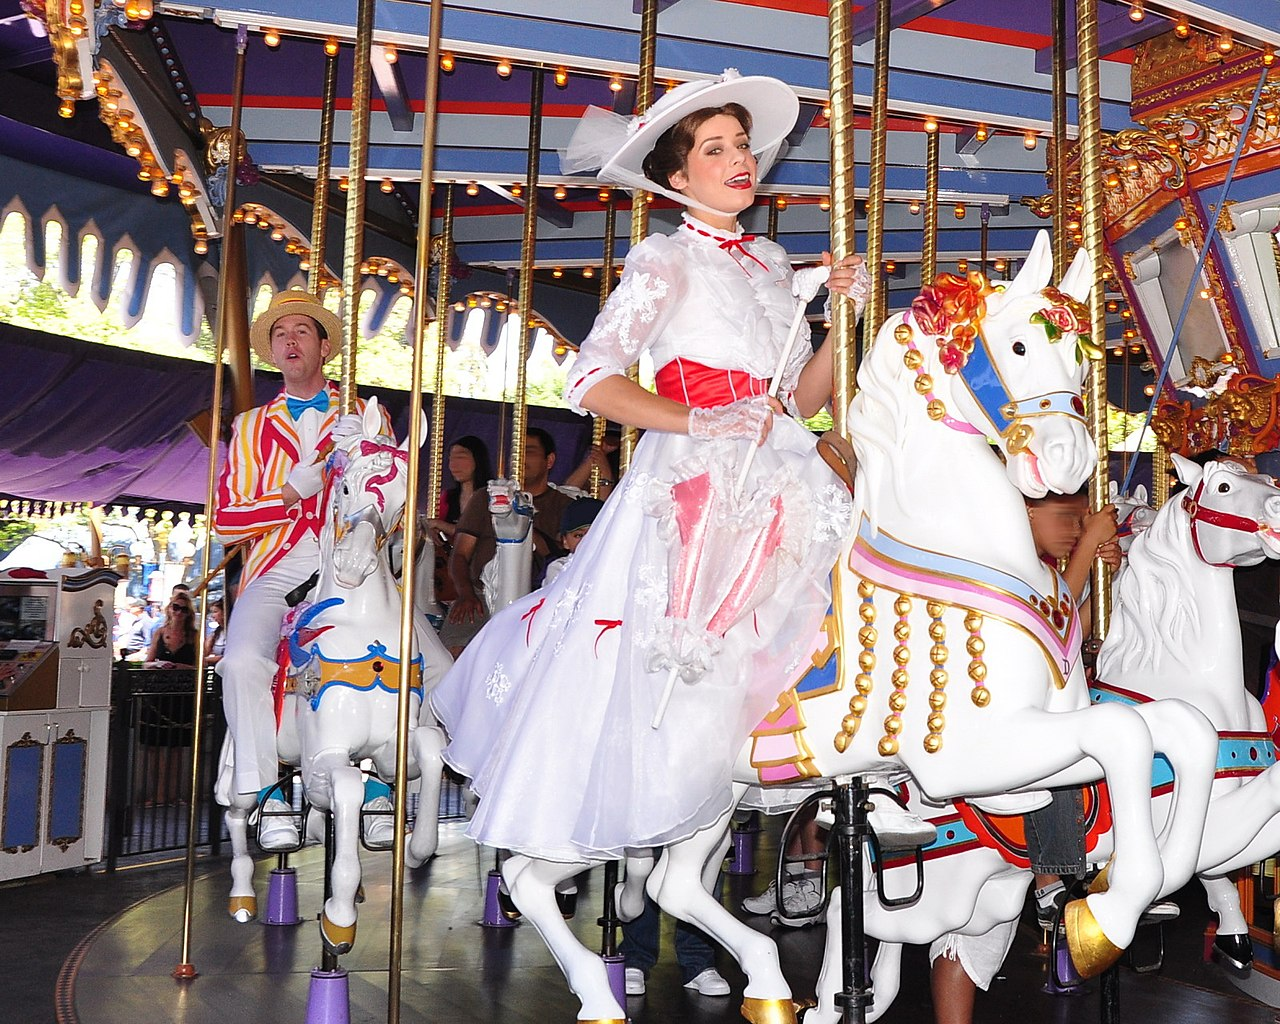 fileking arthur carrousel mary poppins on jinglesjpg